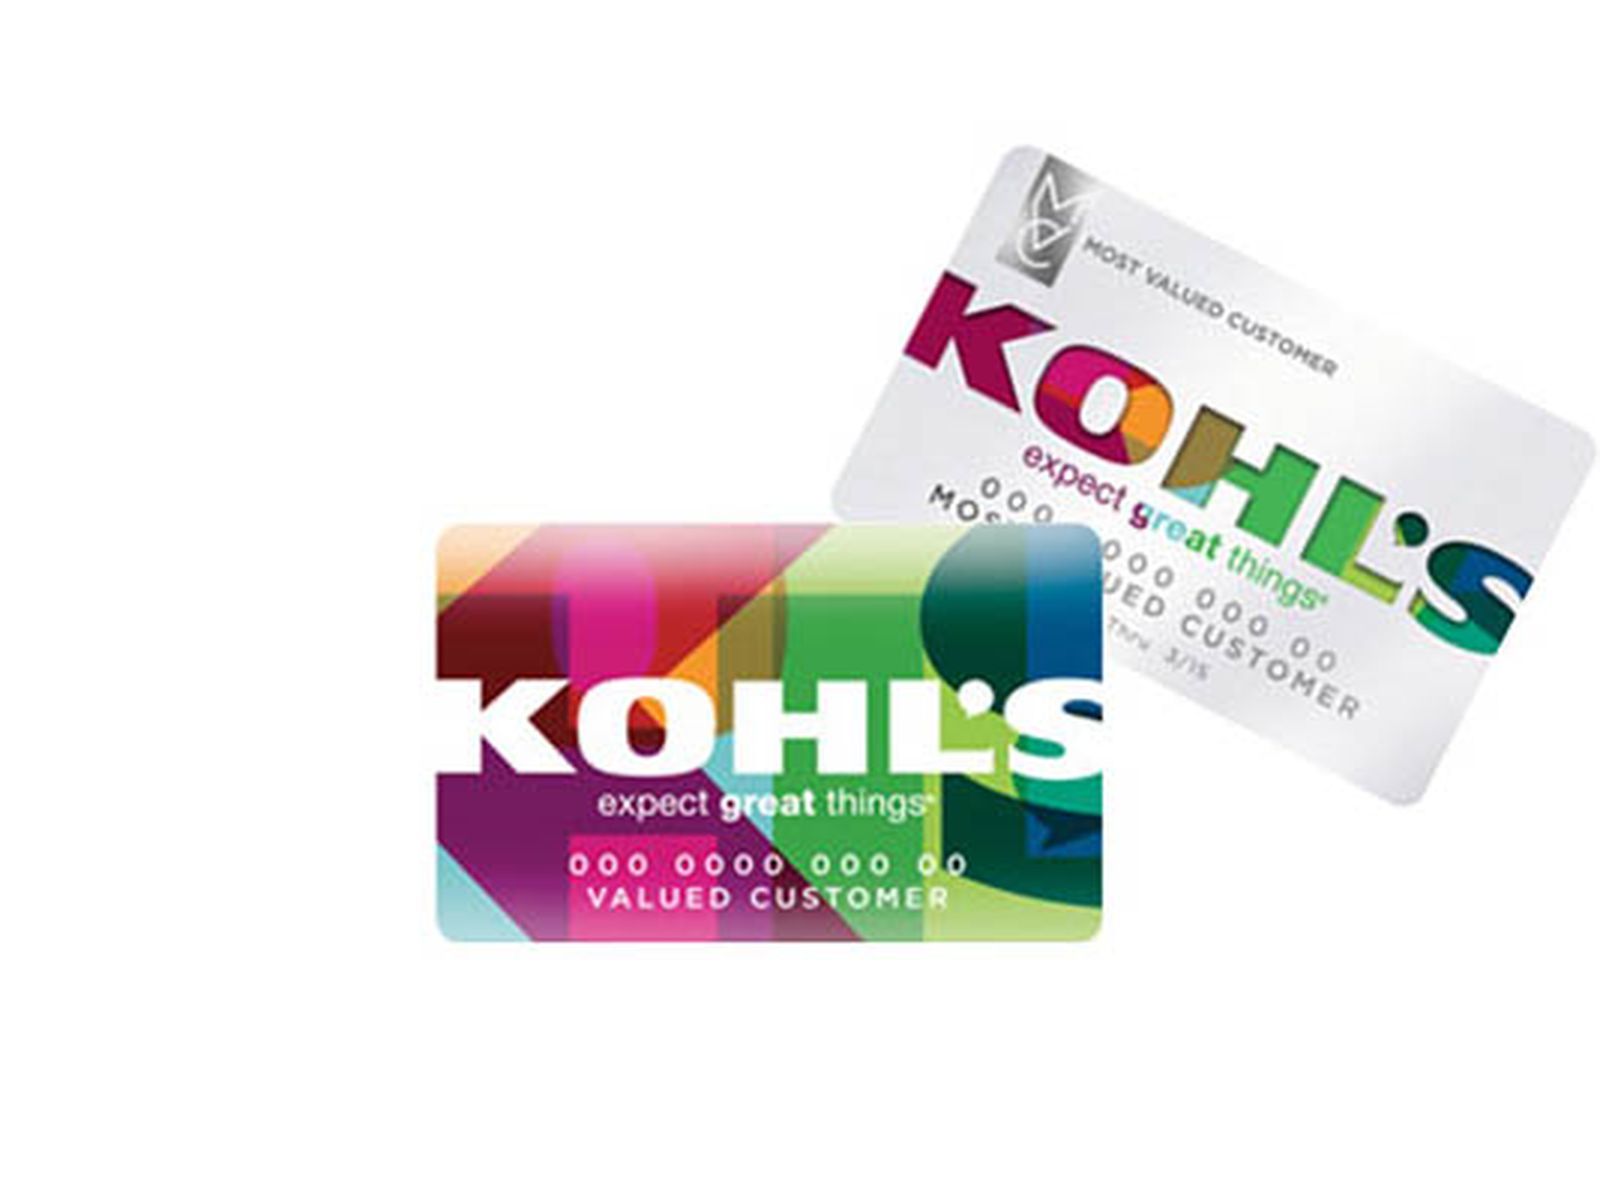 kohls featured